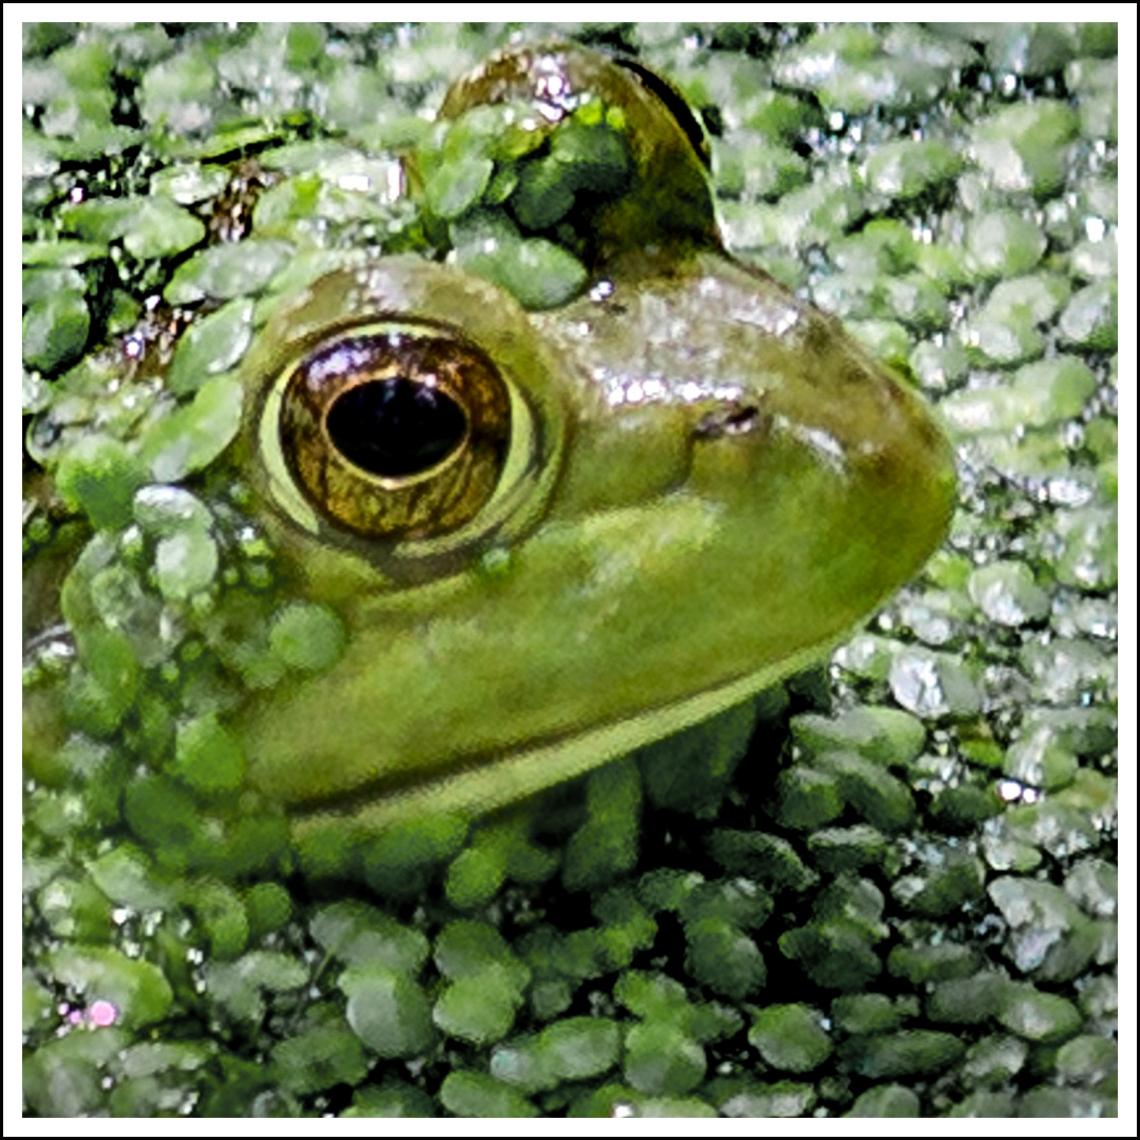 Frog 4x6 (2) - Copy